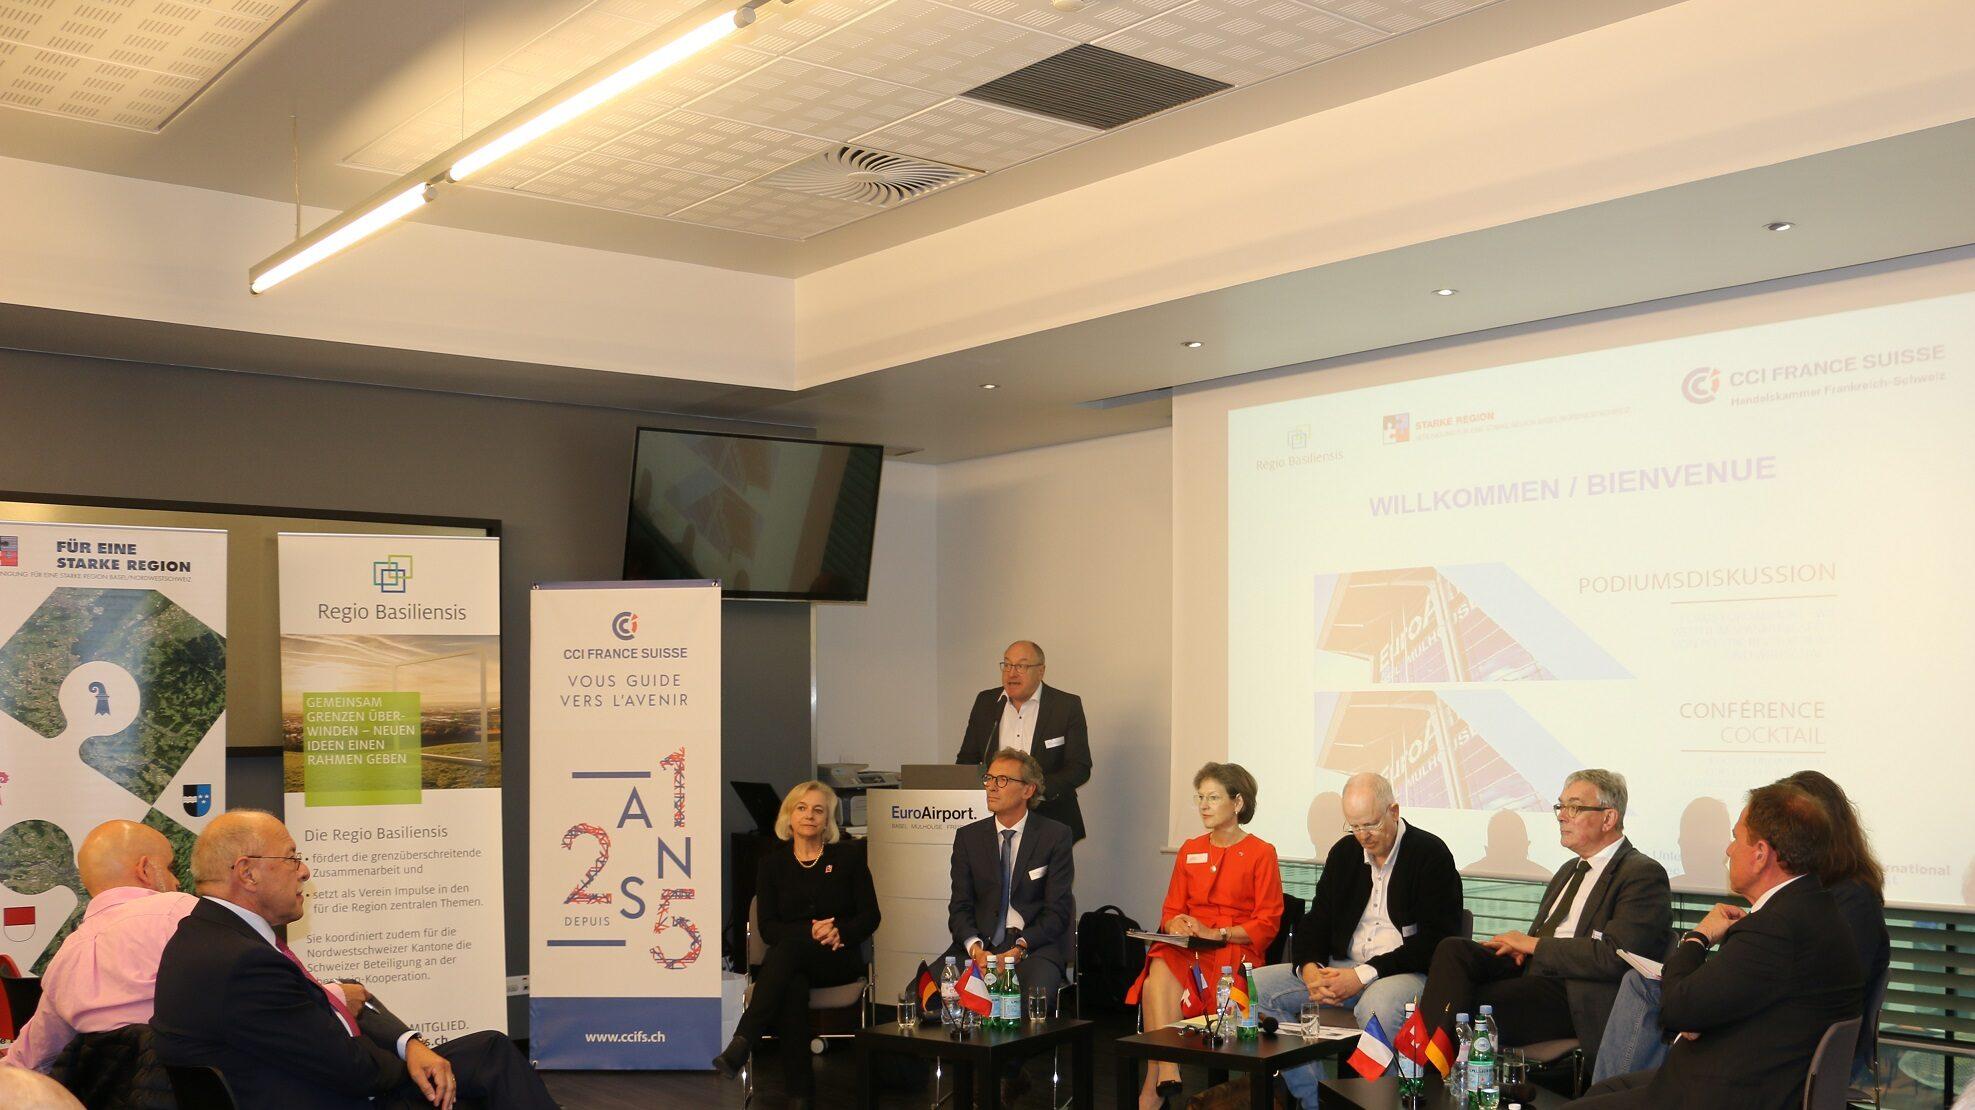 Podium diskutiert die Spannungsfelder um den EuroAirport Basel-Mulhouse